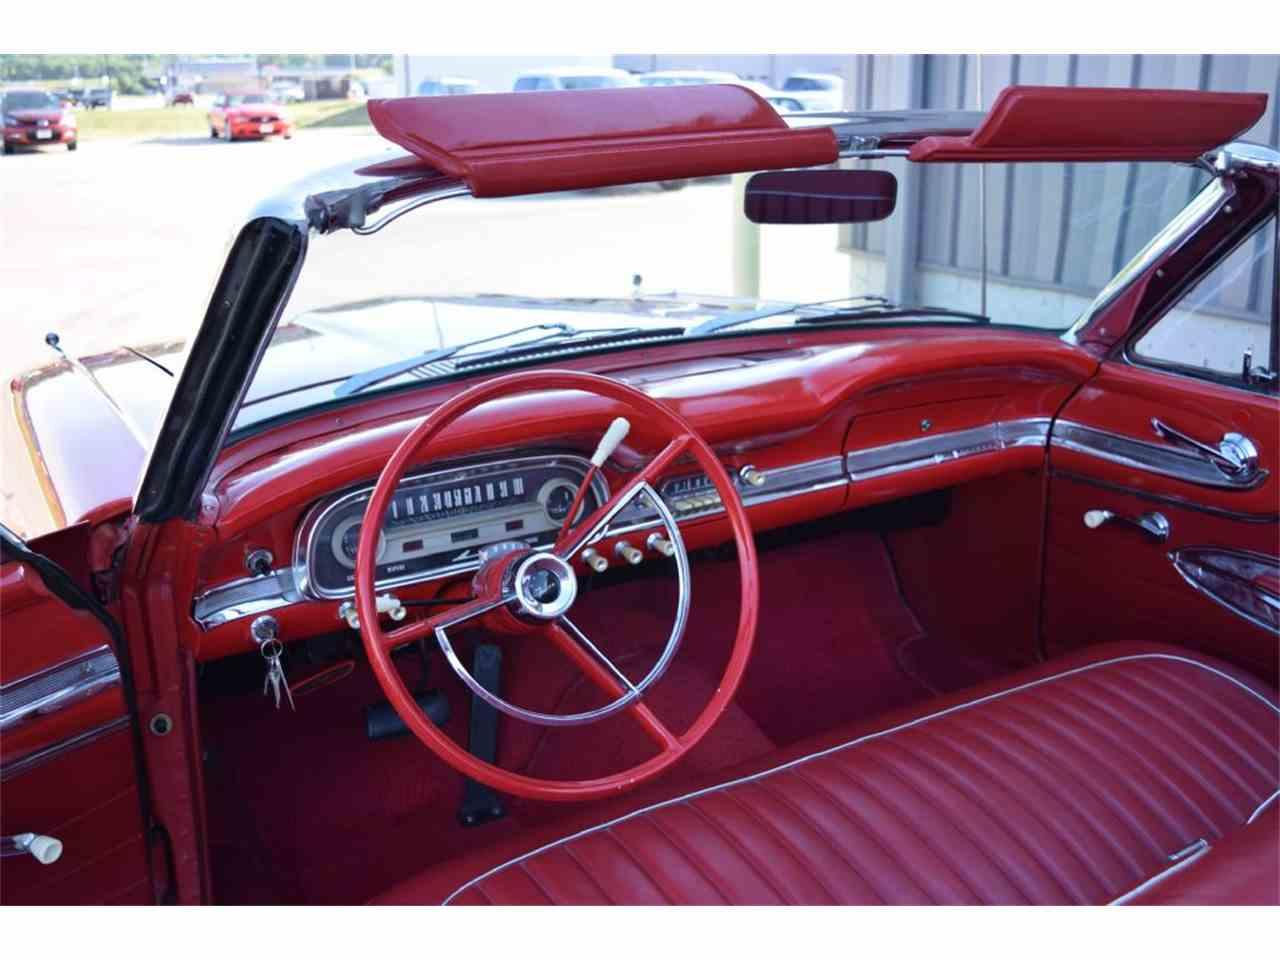 Large Picture of '63 Ford Falcon Futura located in Sioux City Iowa - $24,900.00 - LUN9